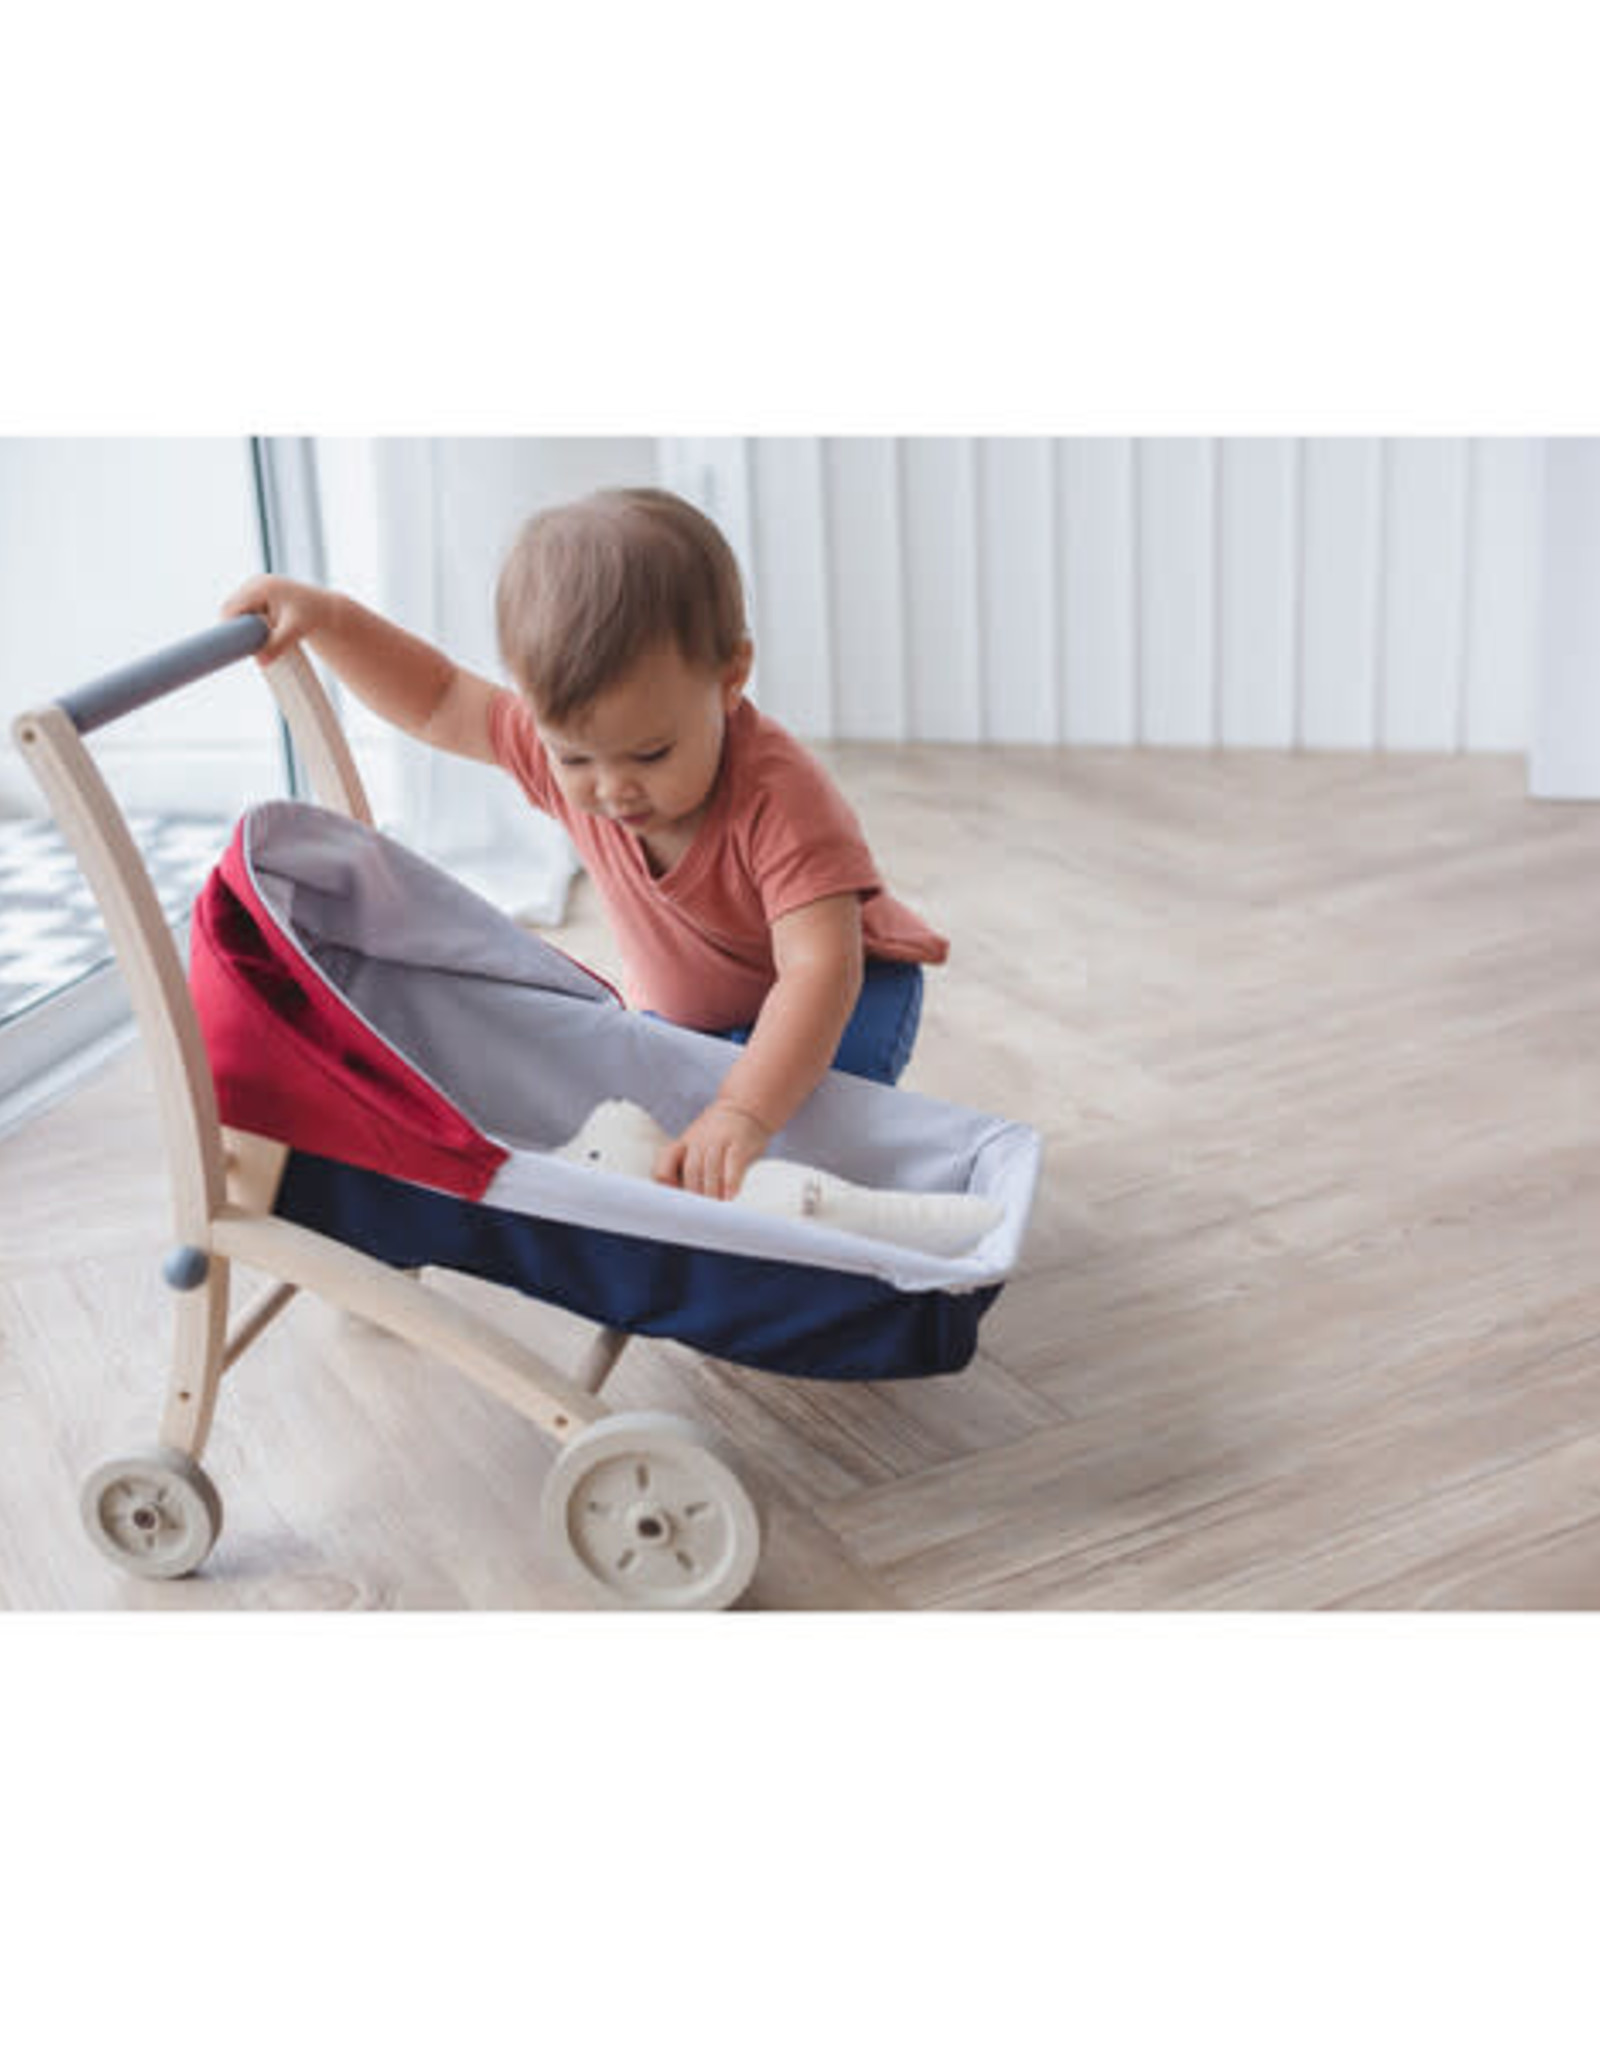 Plan Toys Doll Stroller